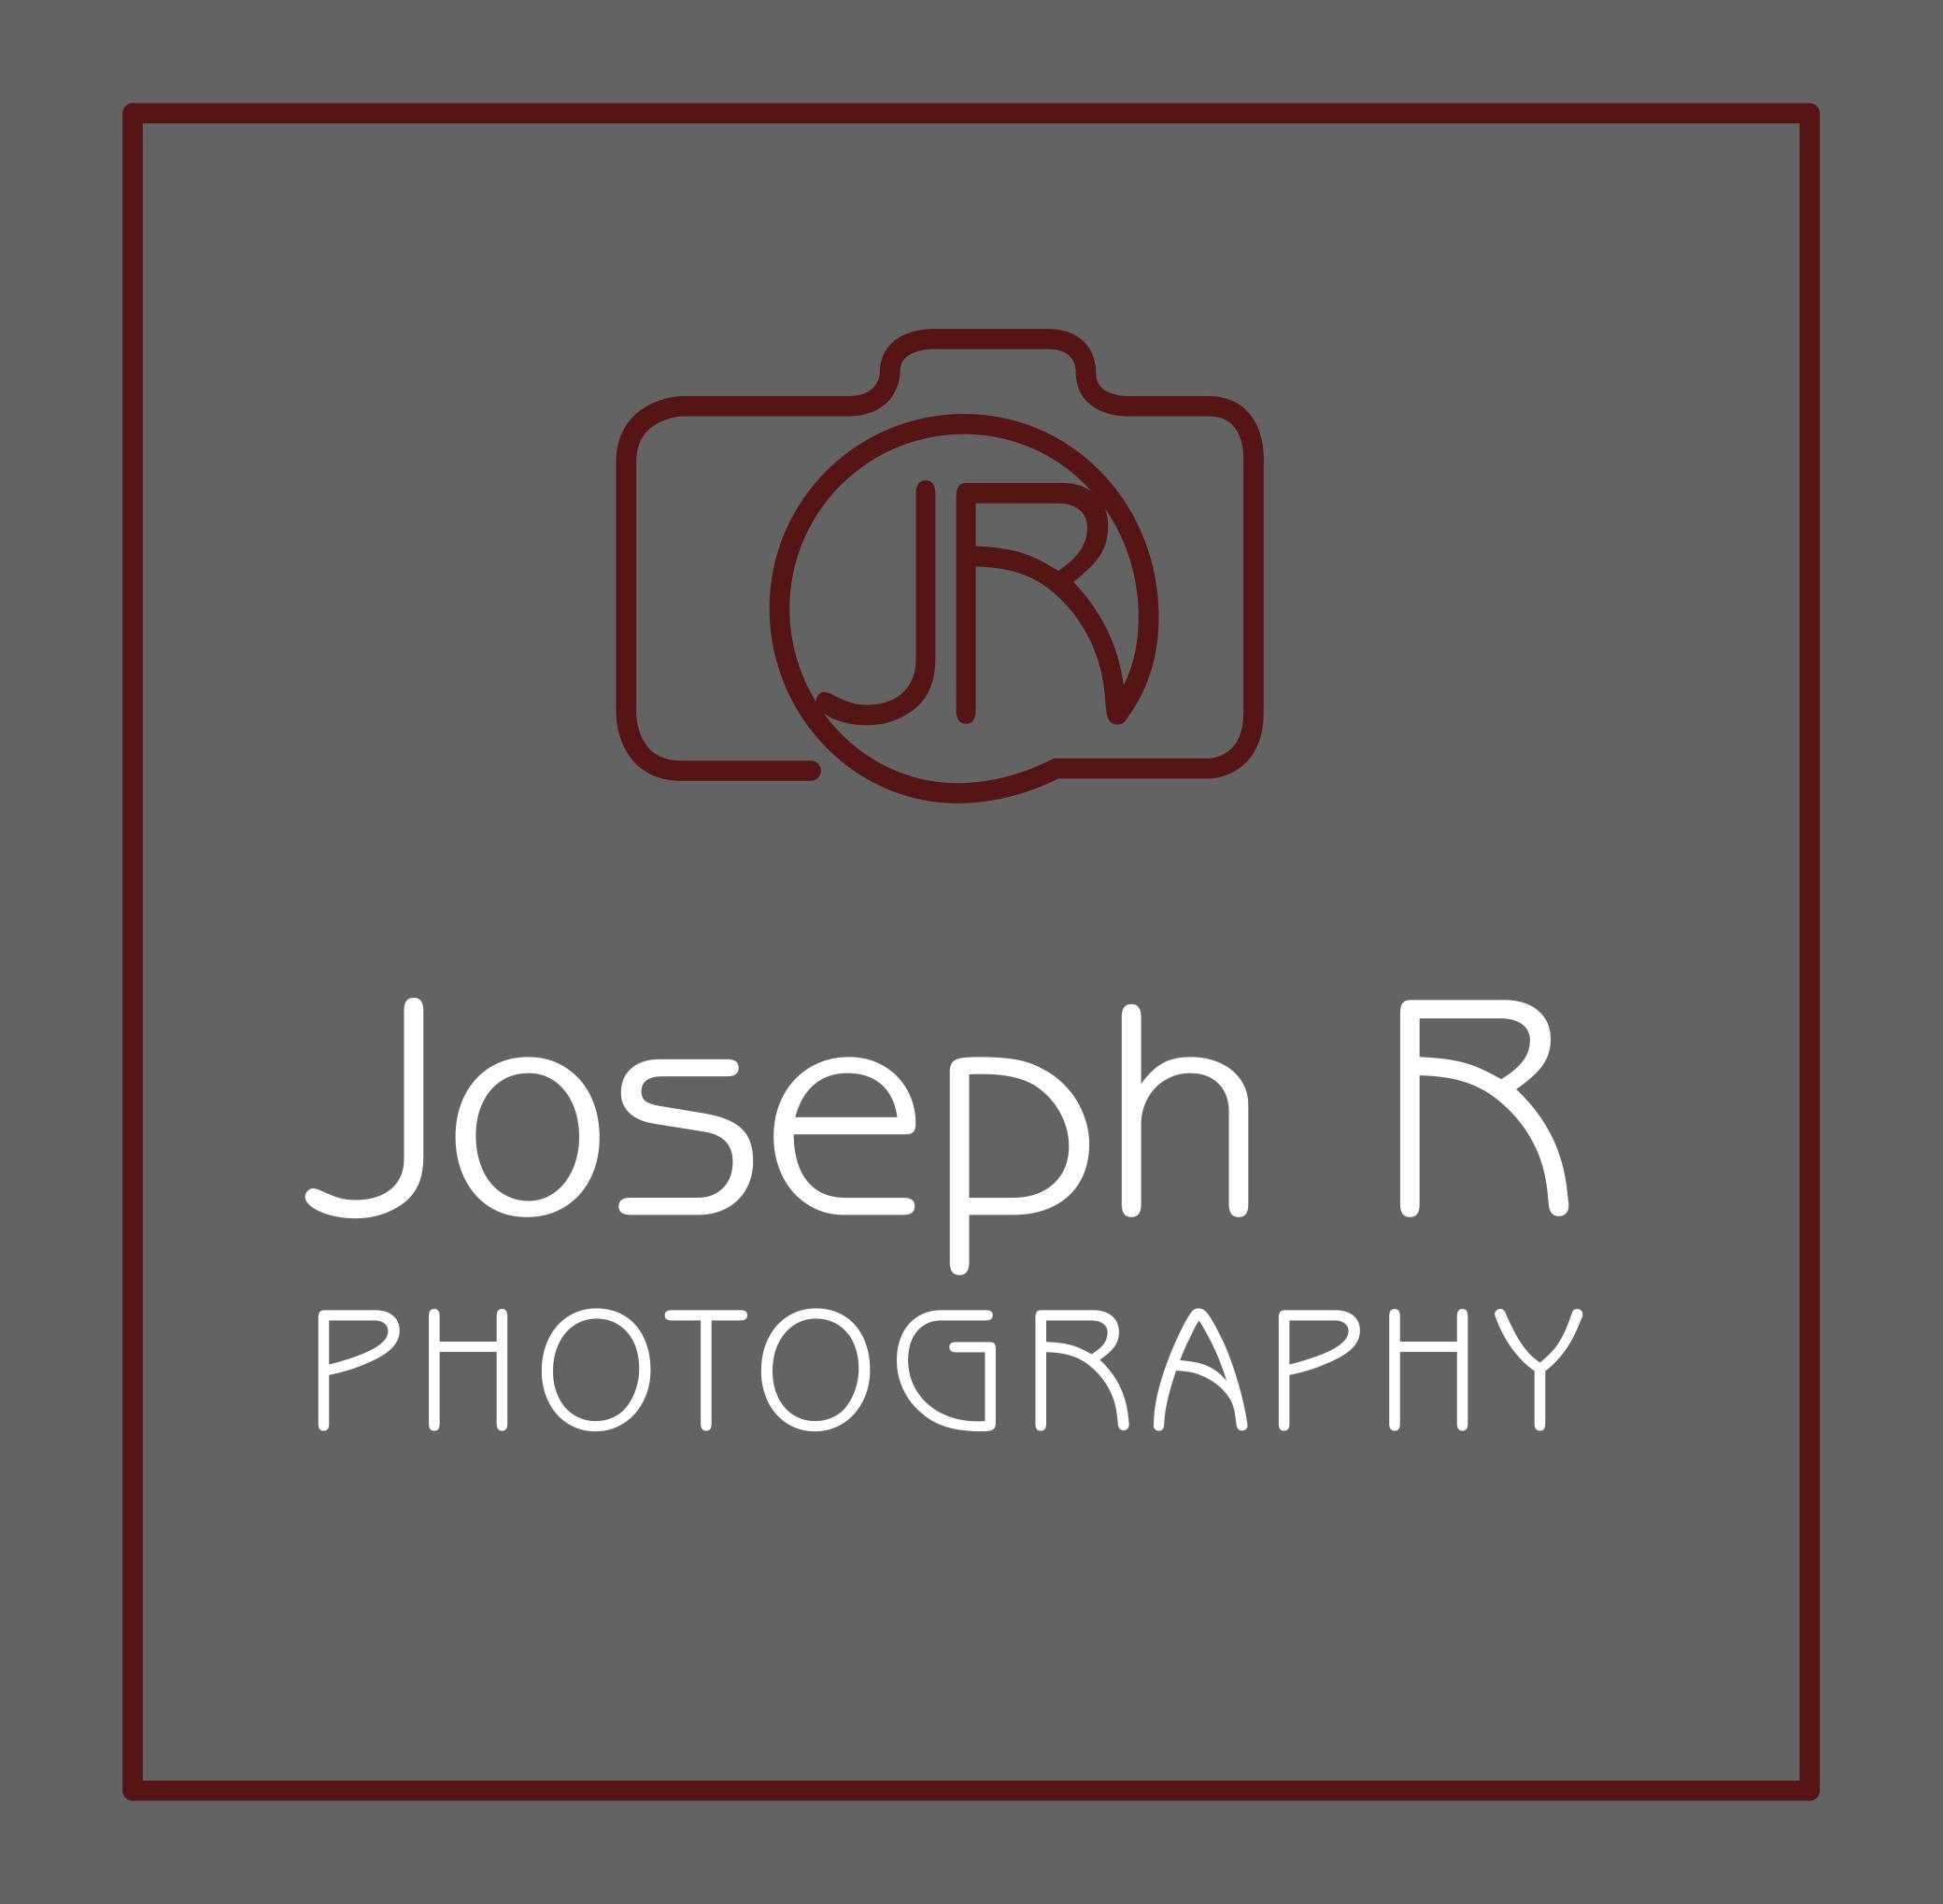 Joseph R Photography